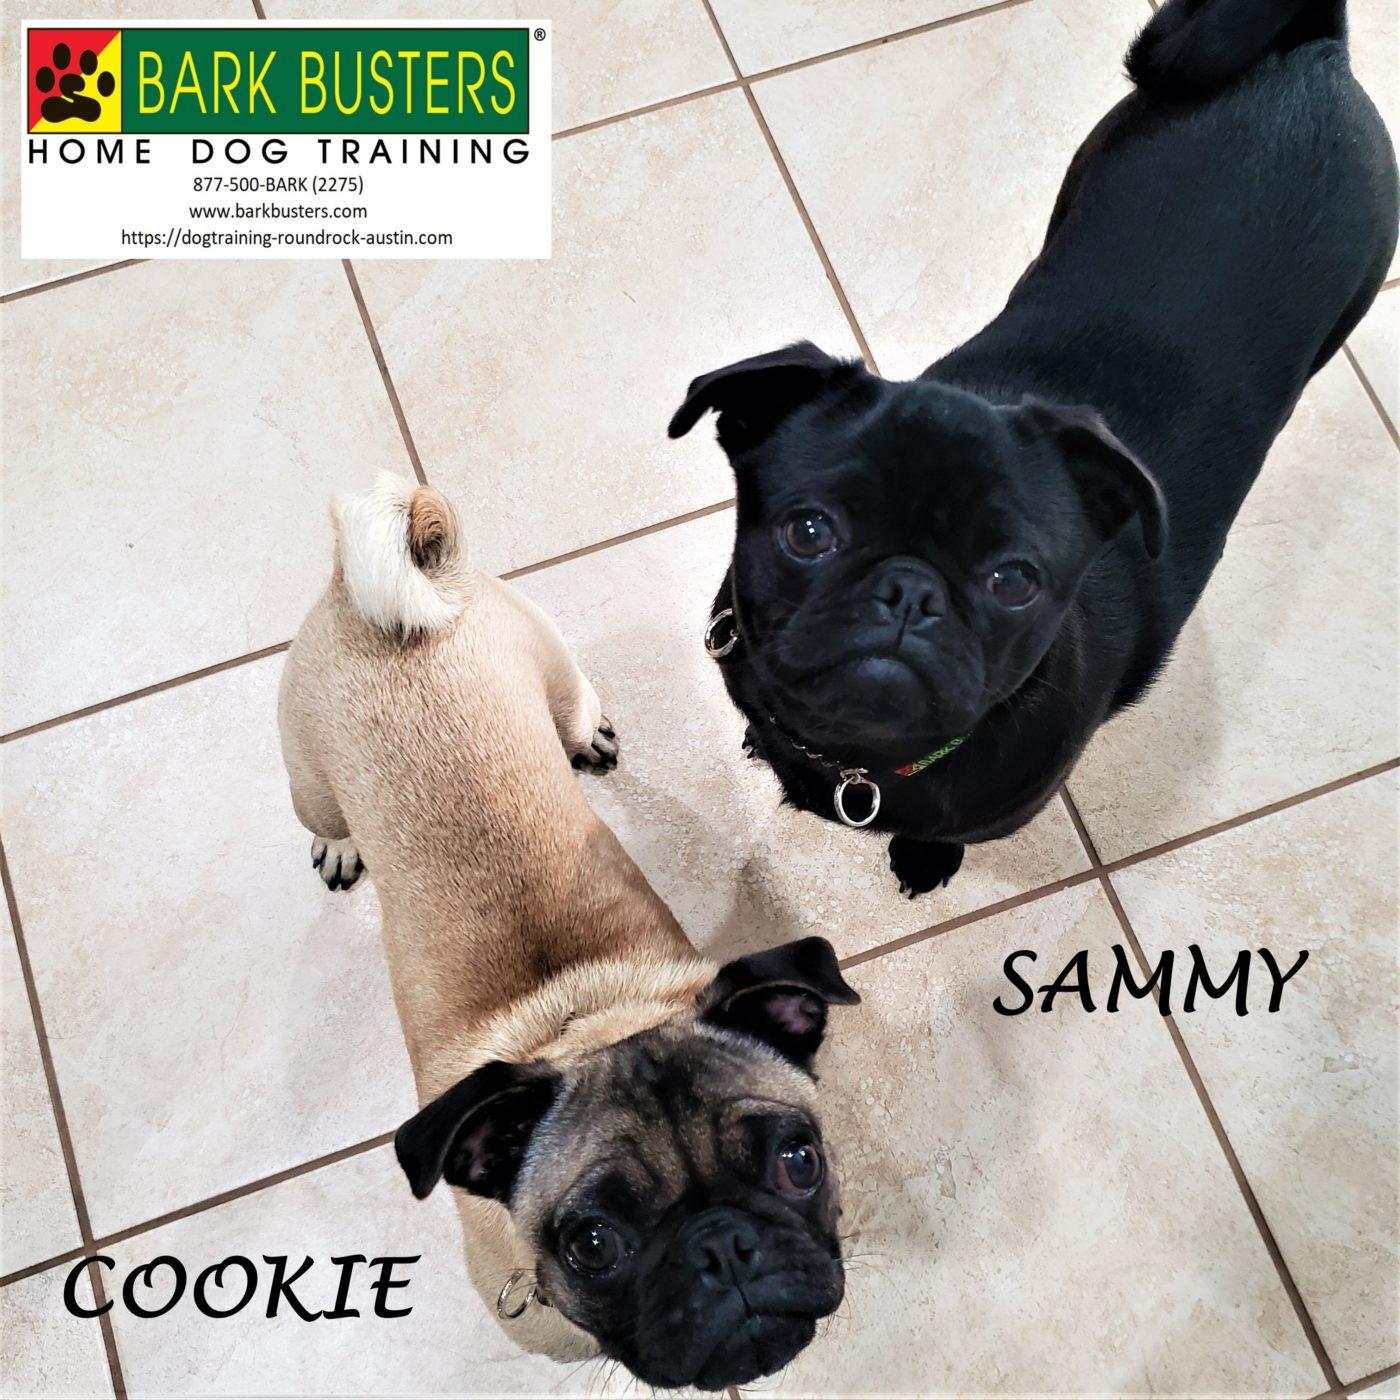 #pug #doormanners #leashtraining #obediencetraining #dogtrainingroundrock #dogsofbarkbusters #barkbusters #speakdog #inhomedogtraining